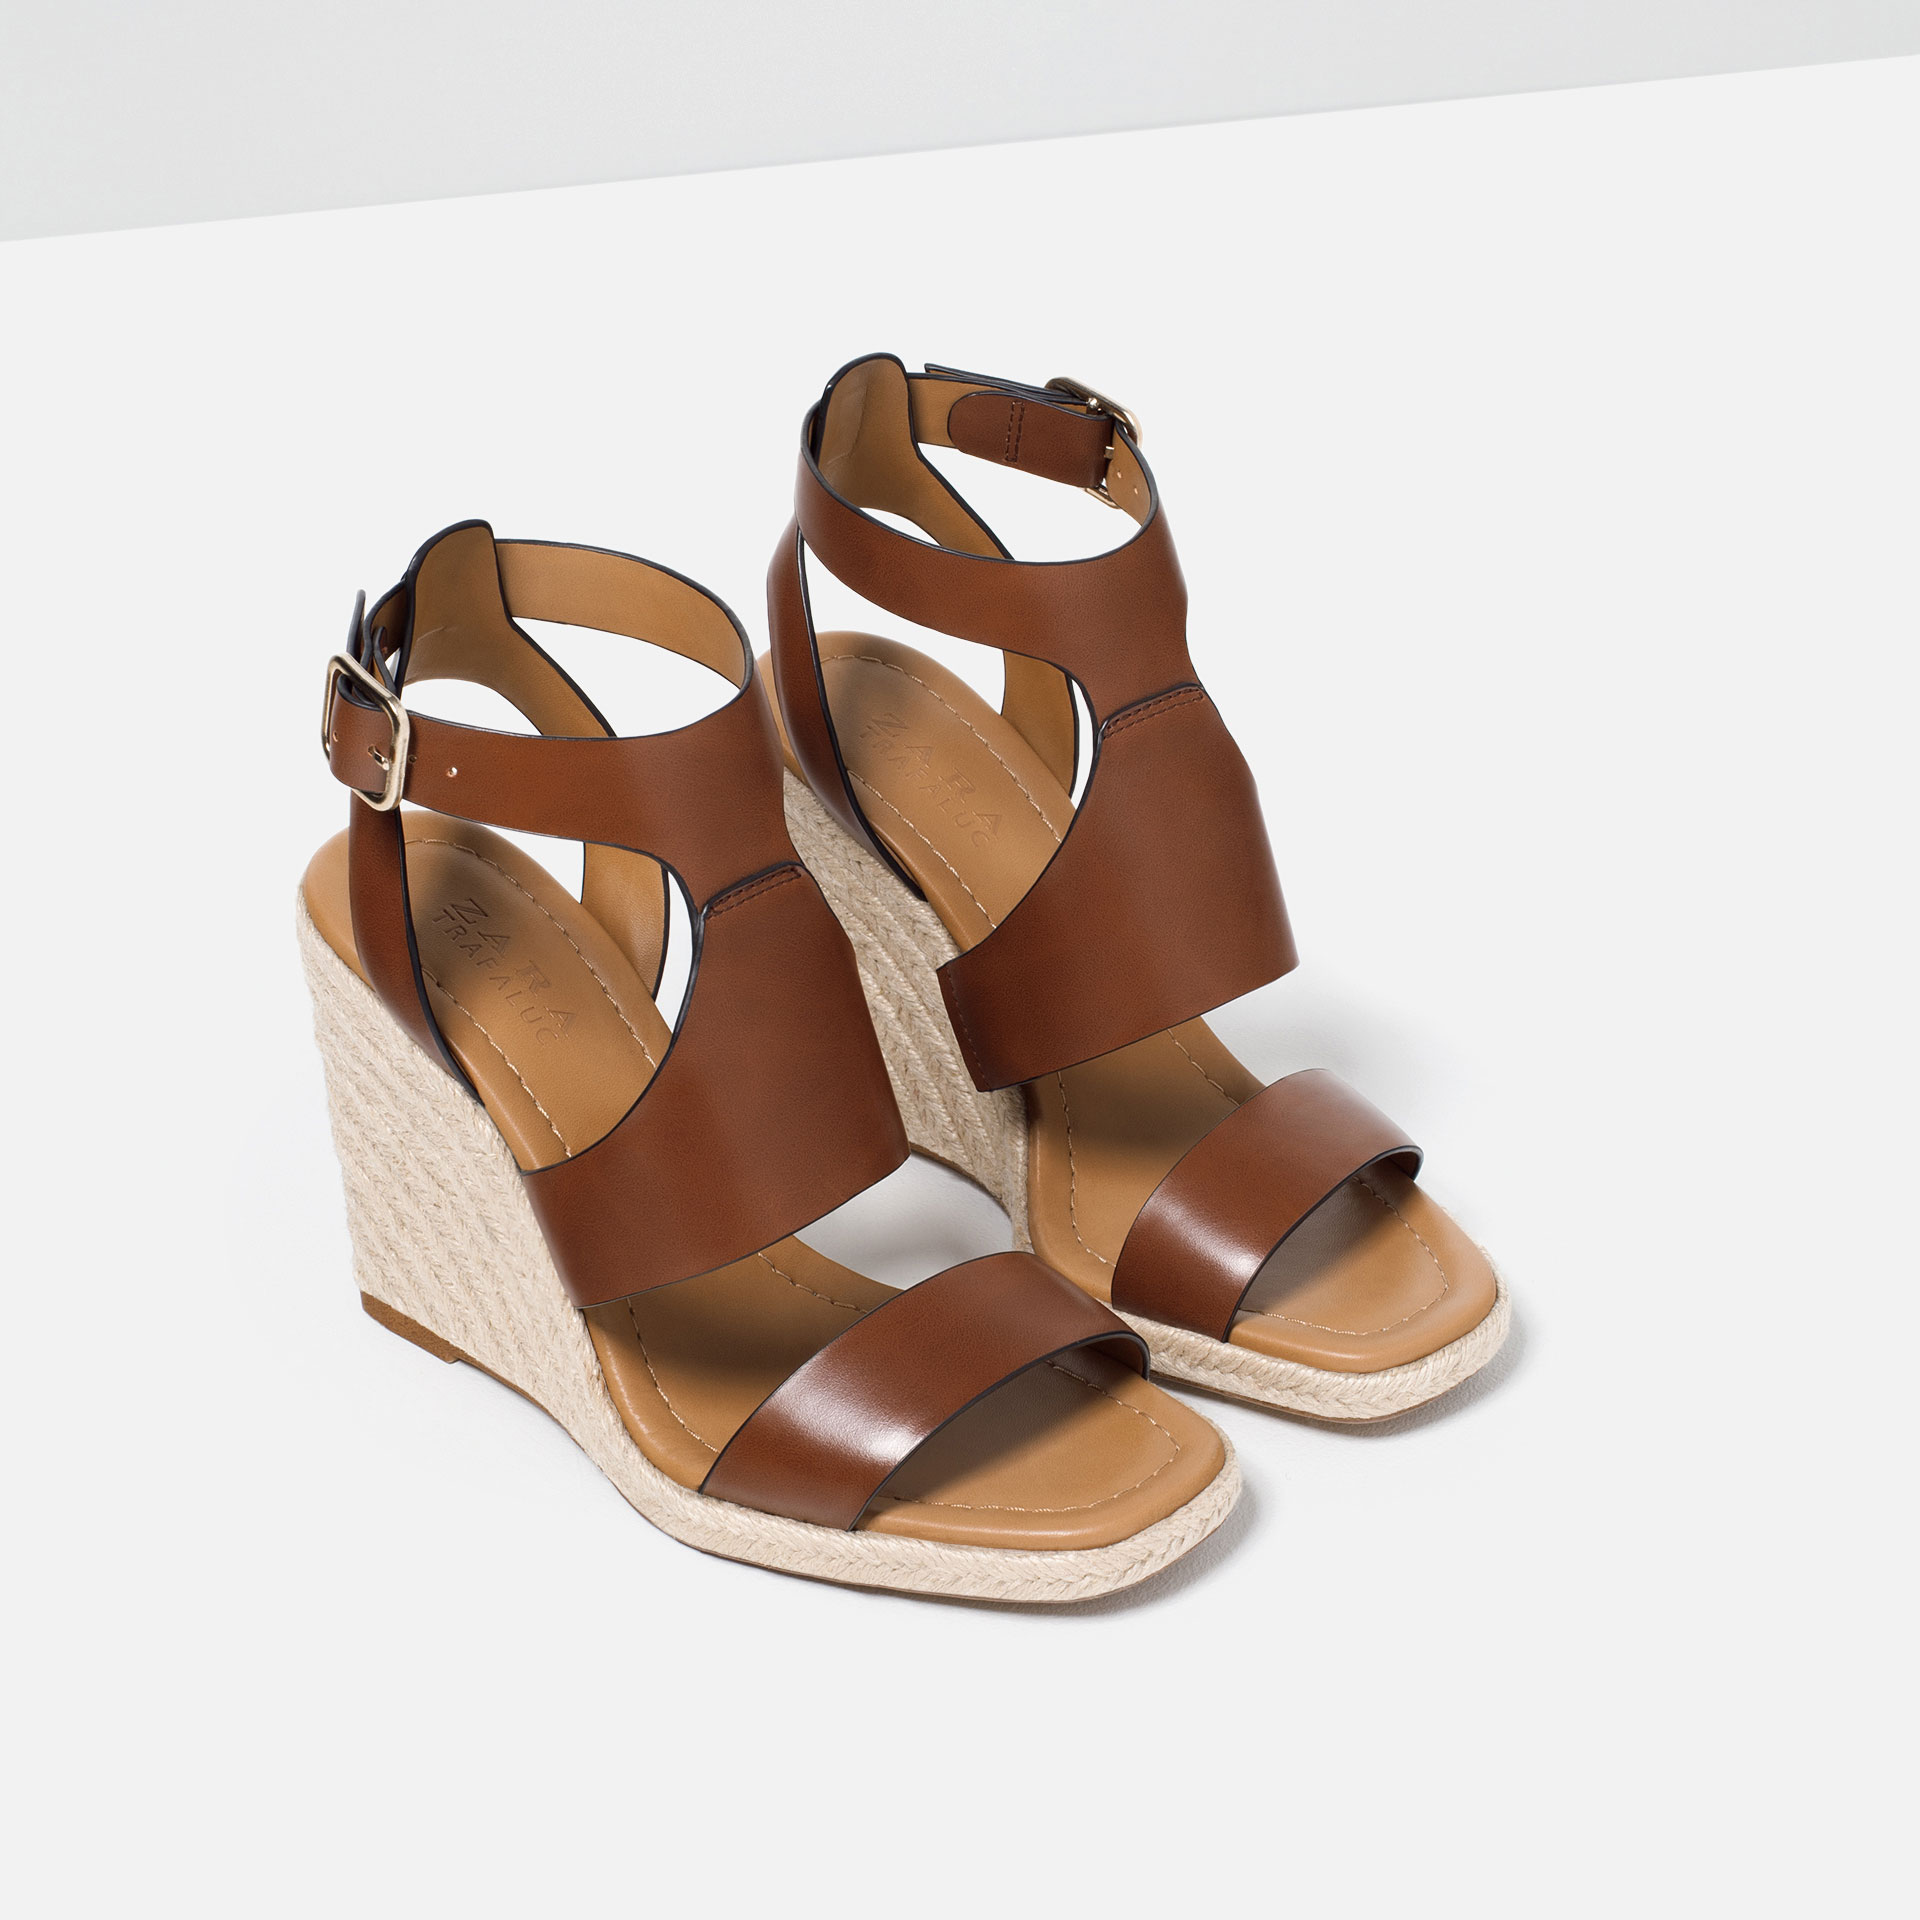 Zara Espadrilles Wedge Sandals in Brown